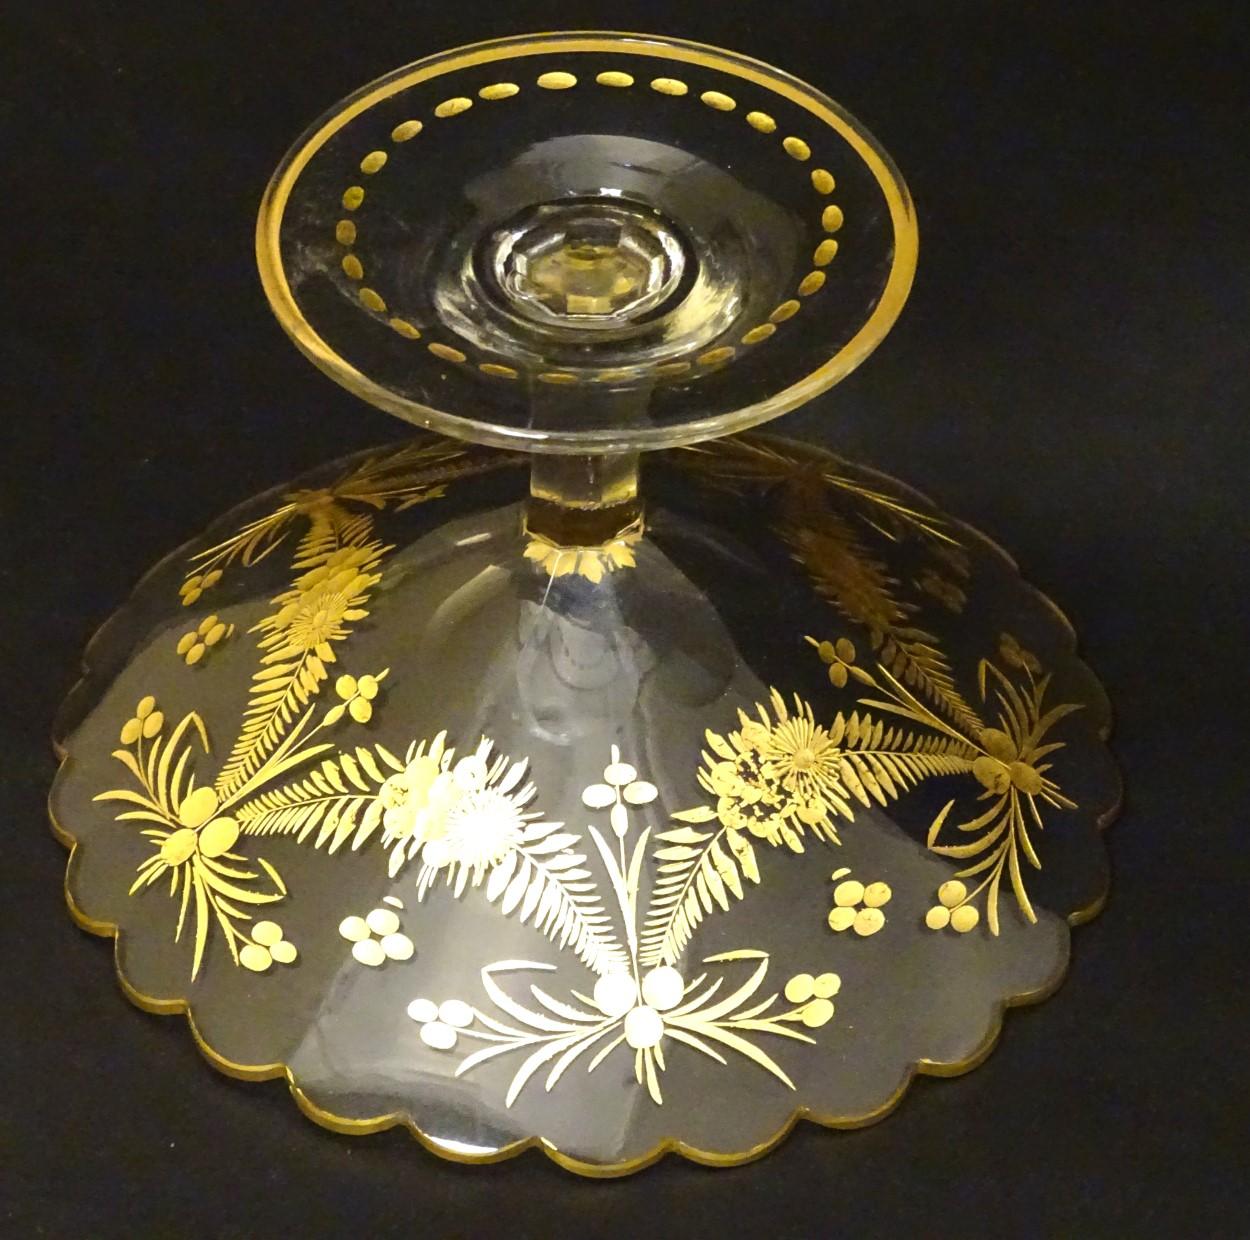 Lot 113 - Saint-Louis glass ,